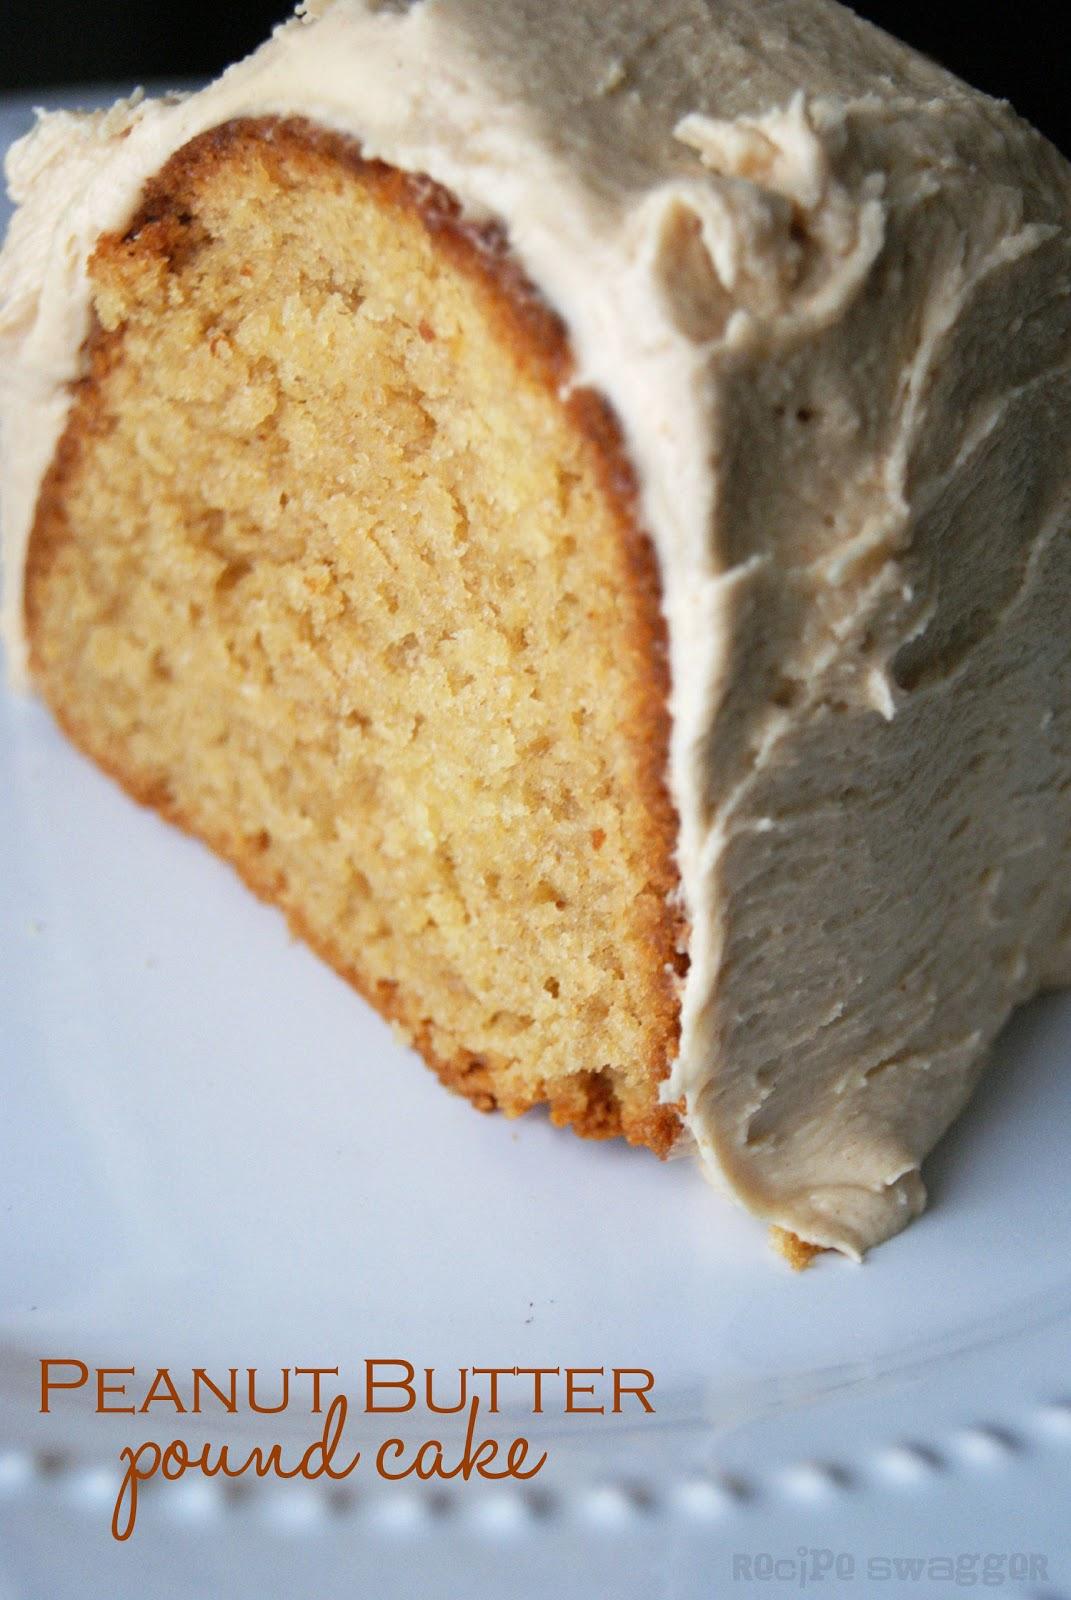 Recipe Swagger: Peanut Butter Pound Cake